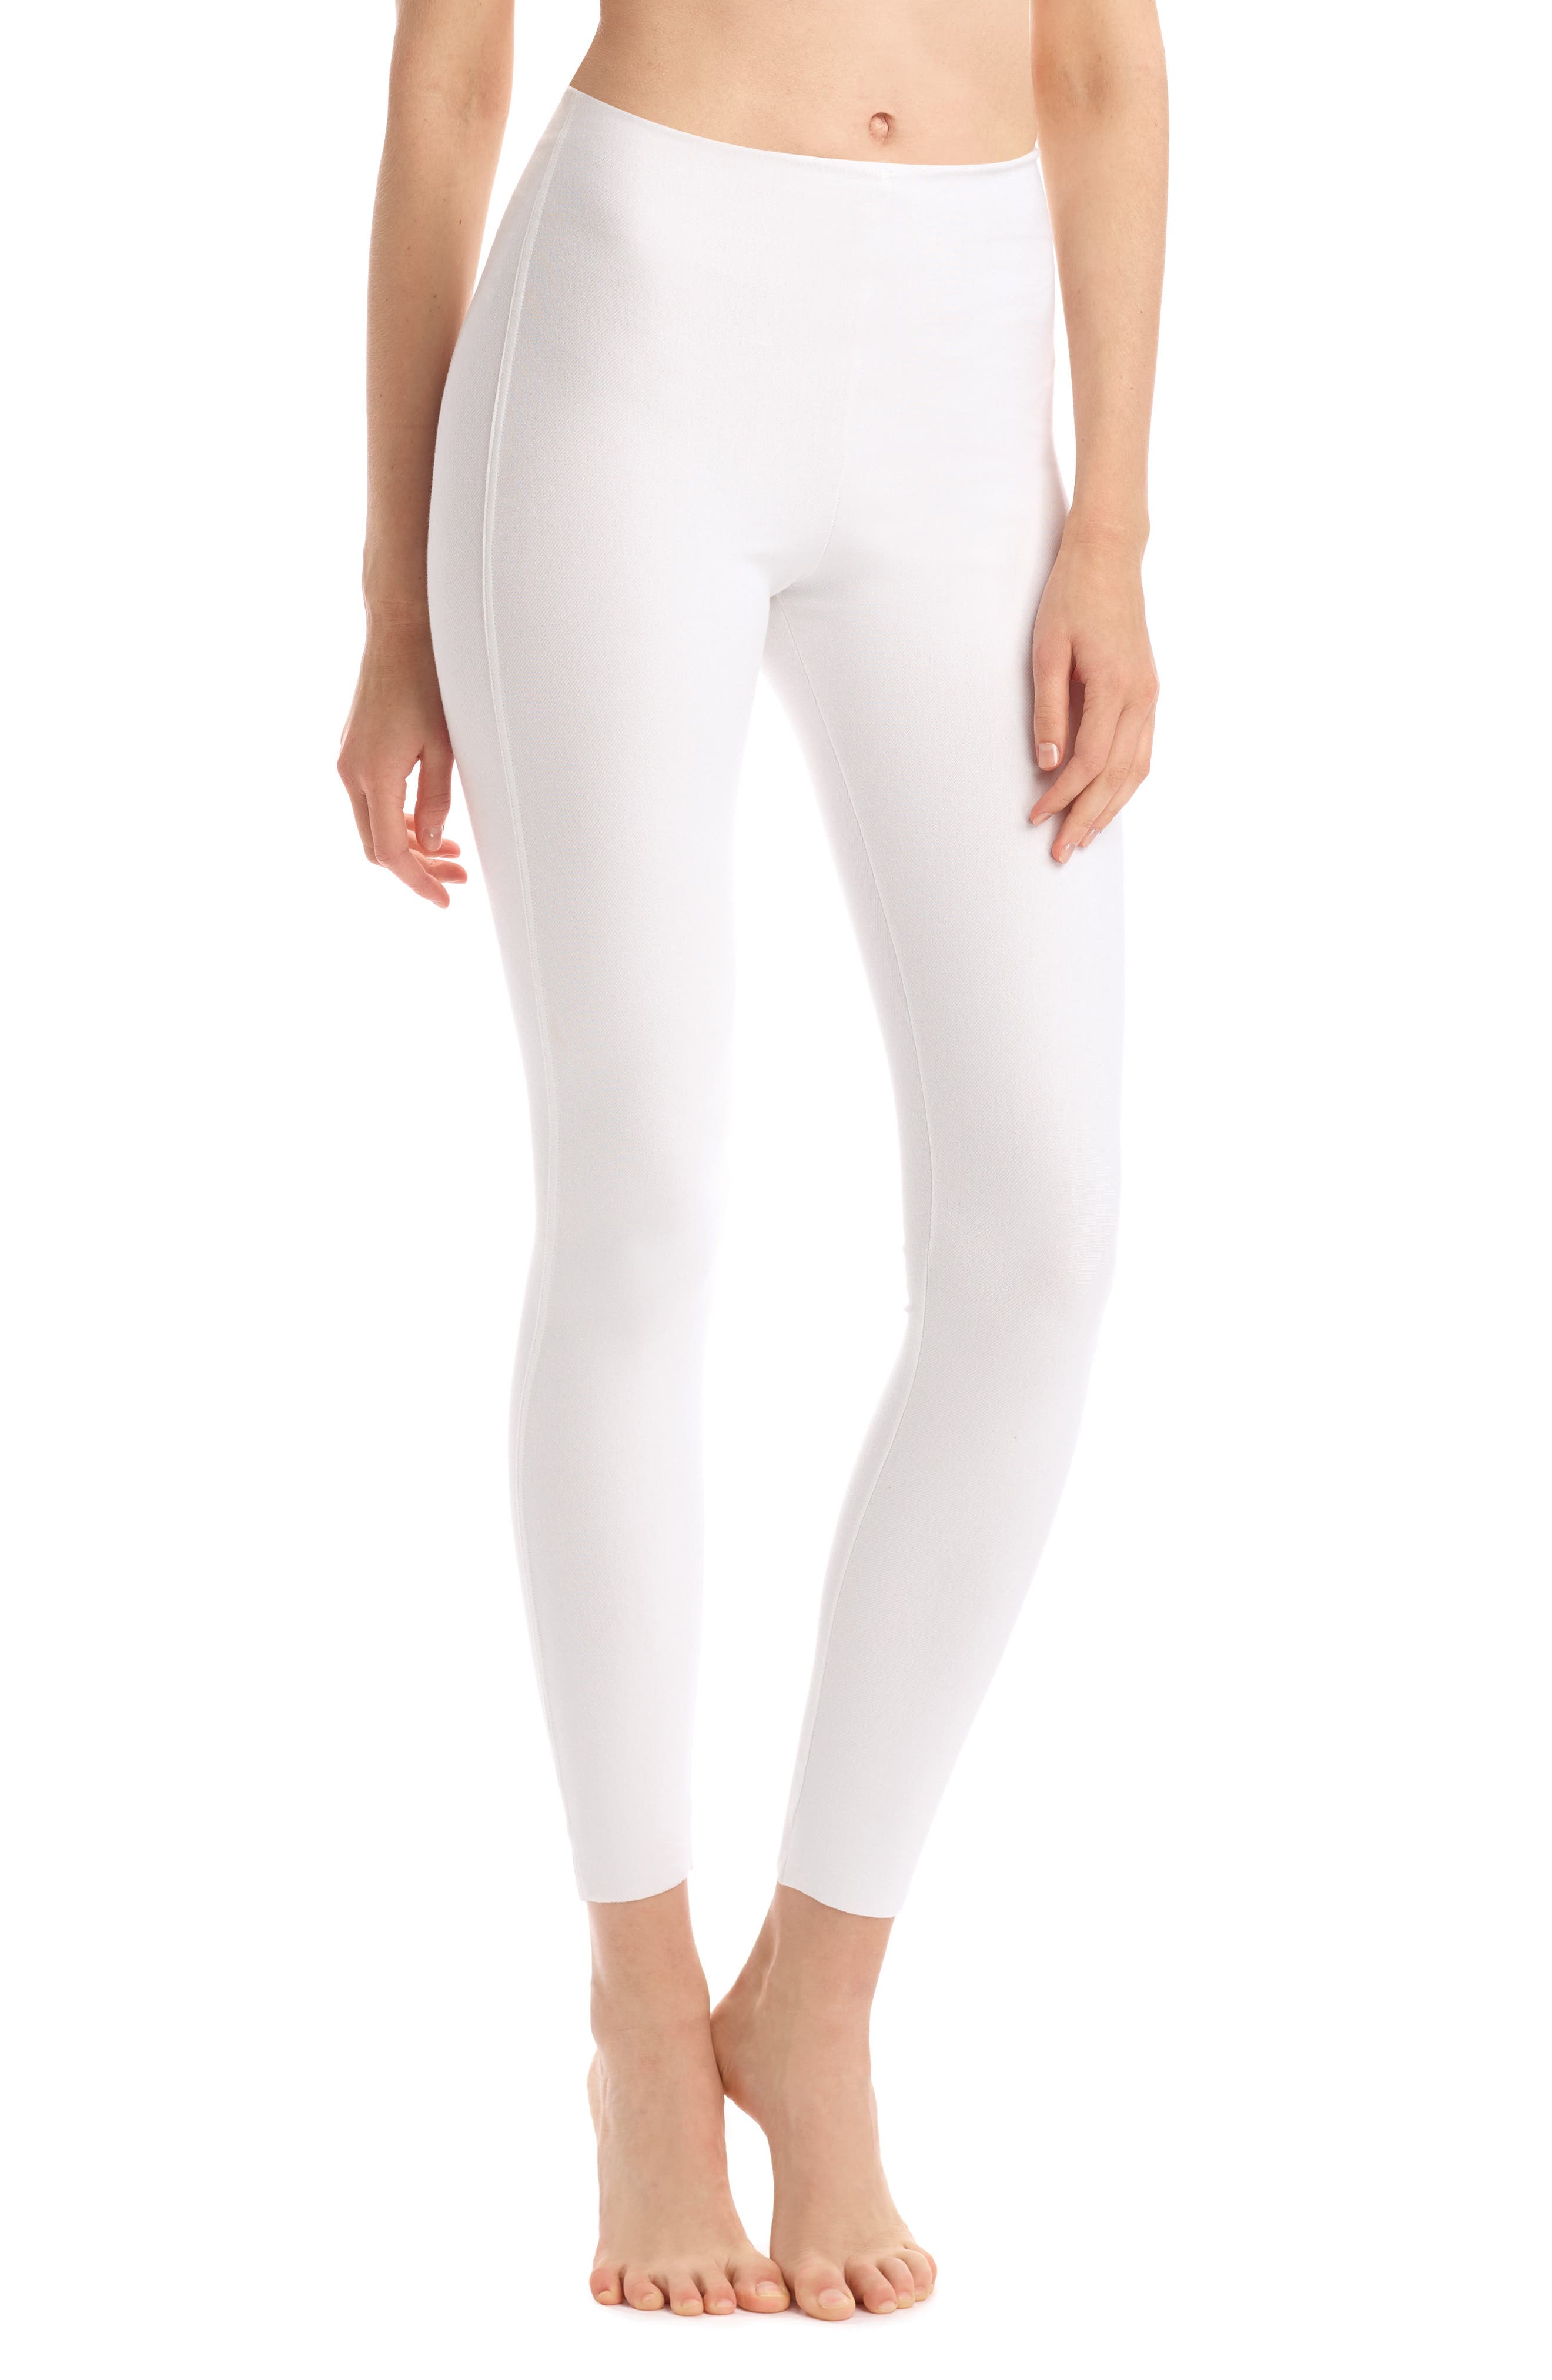 COMMANDO Perfect Control Faux Leather Leggings, Main, color, WHITE